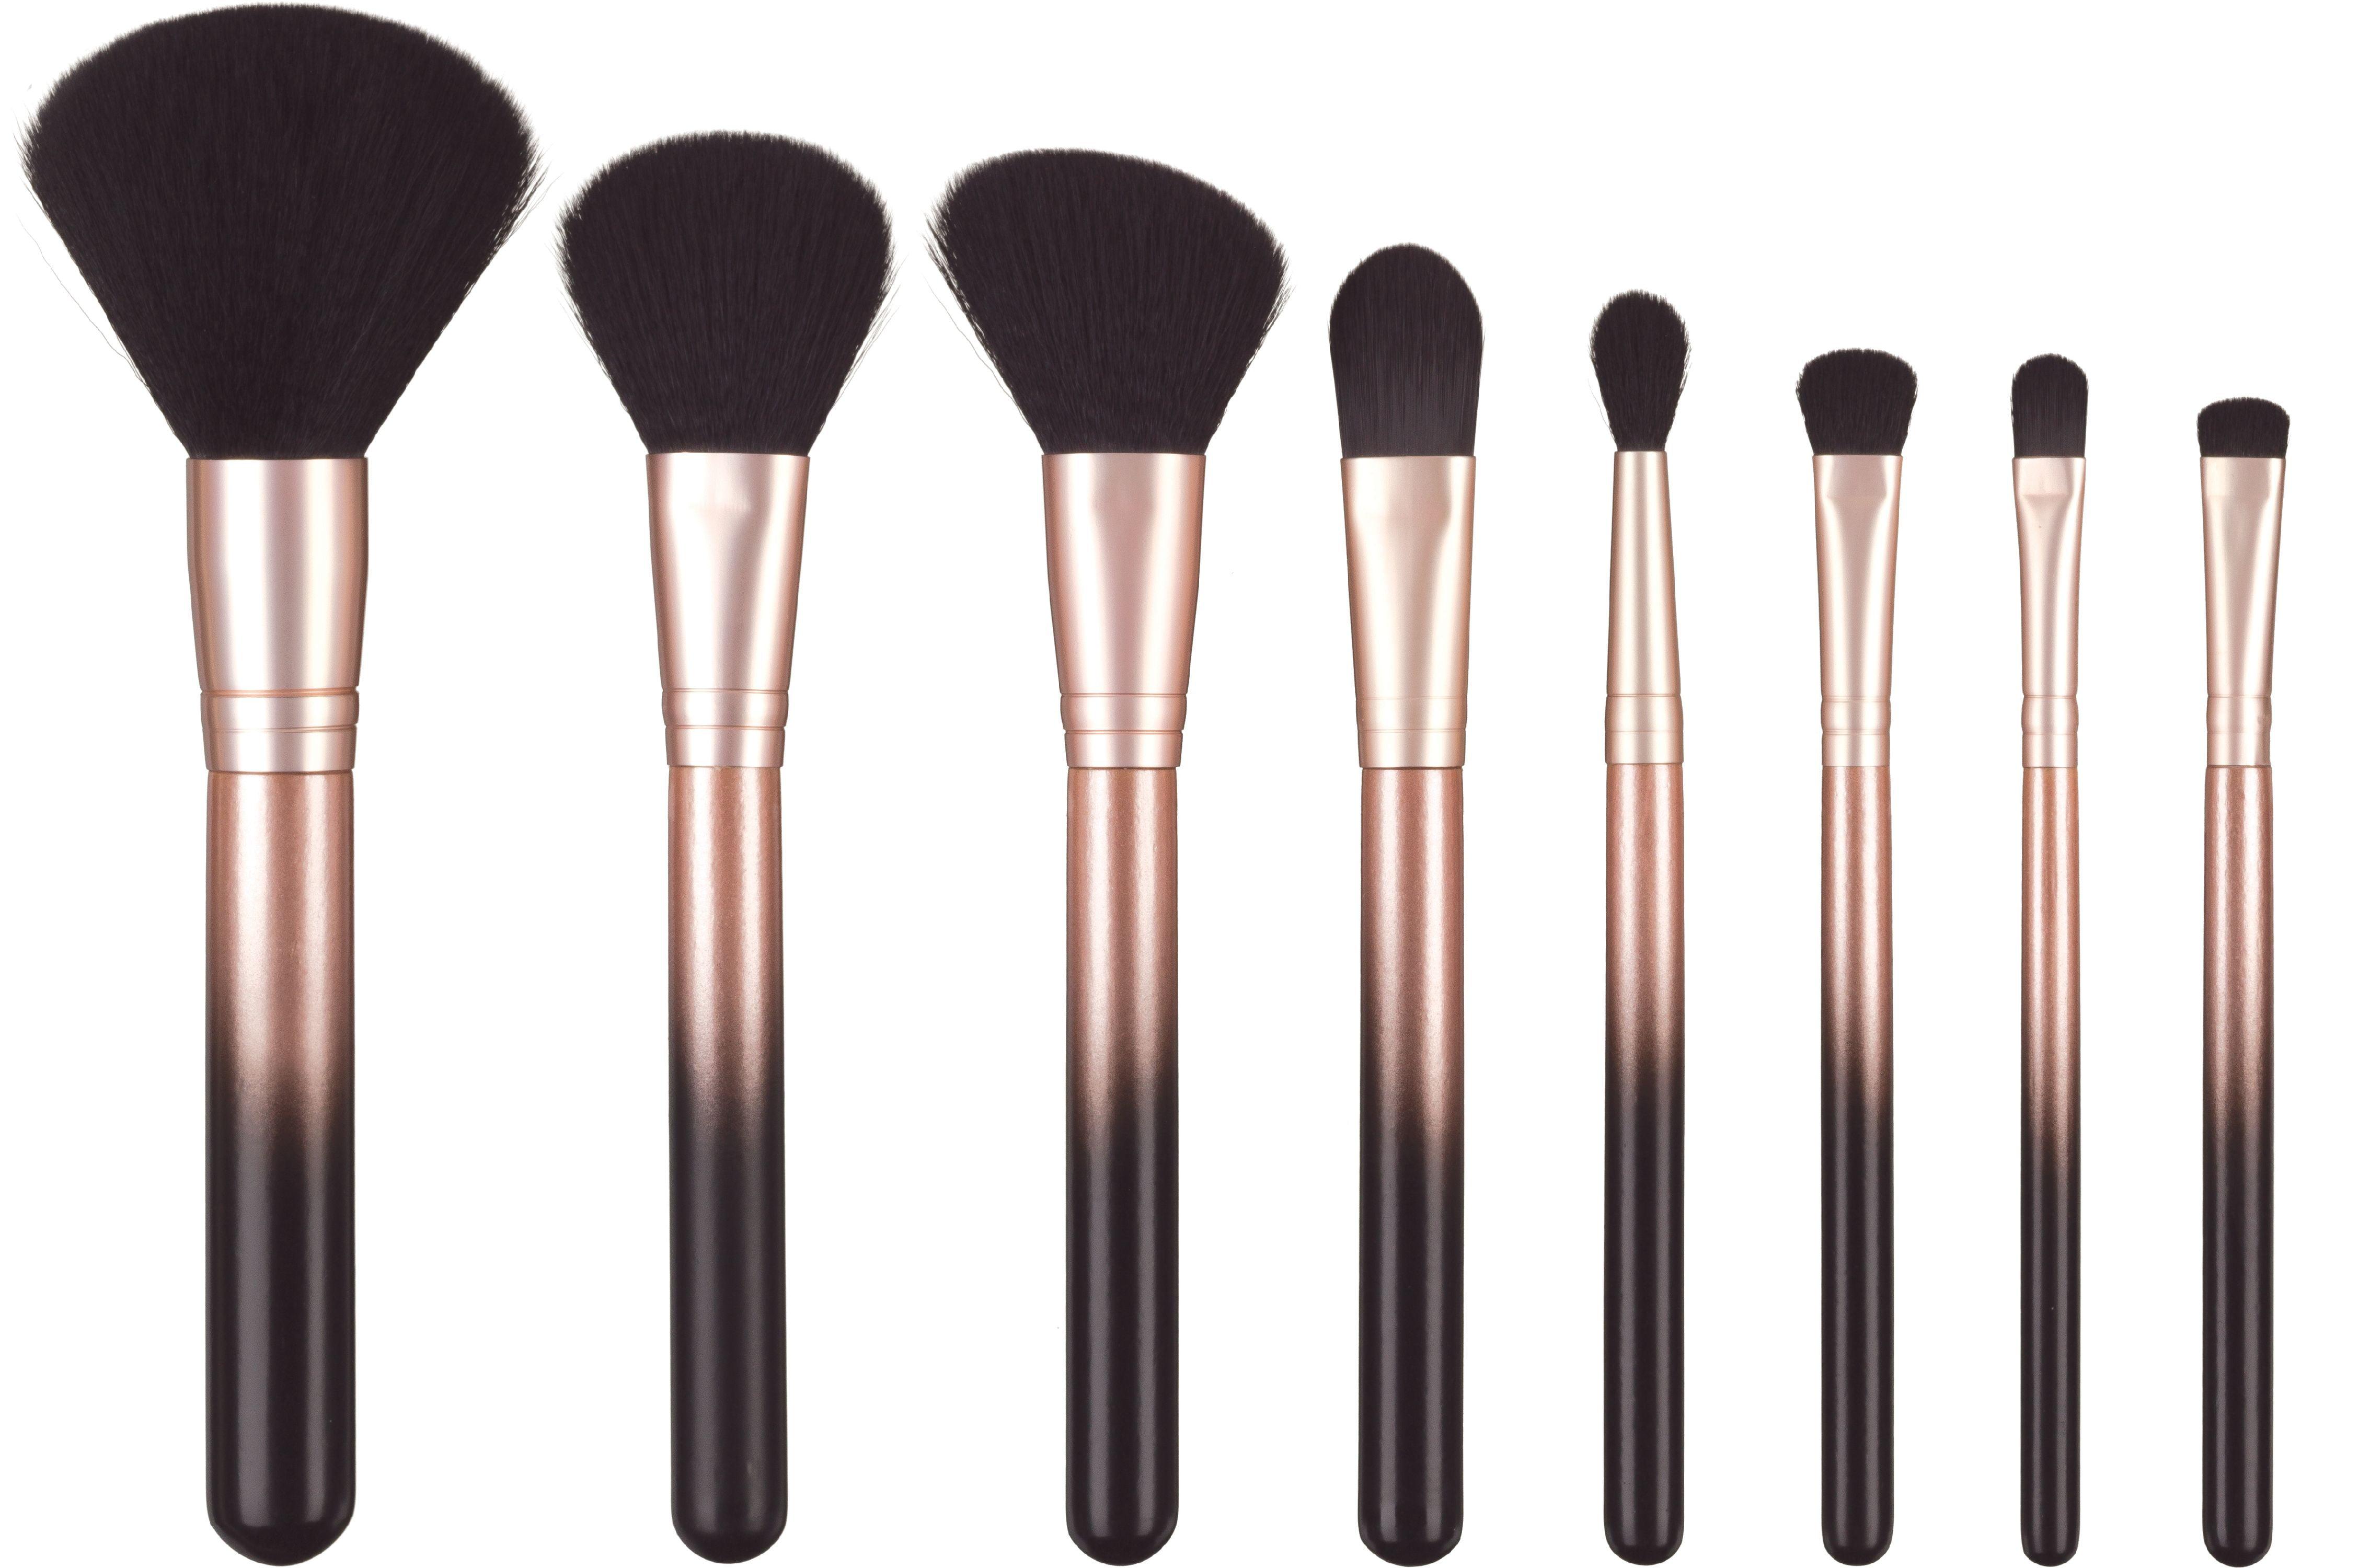 Onesque Pro Essentials Face Makeup